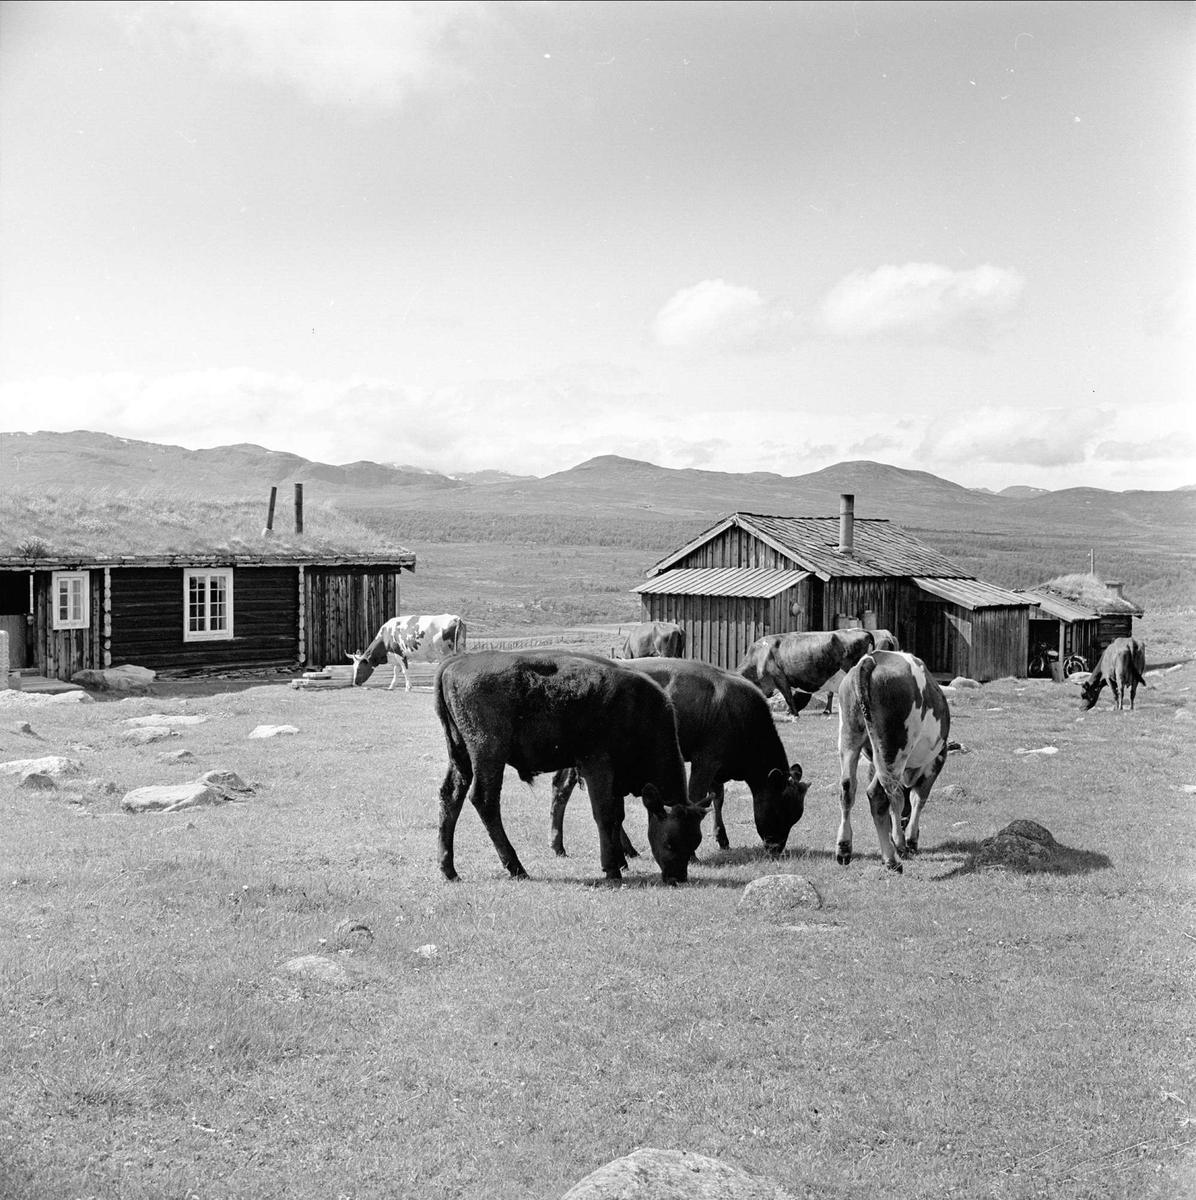 Storhølisætra, Skåbu, Nord-Fron, Oppland, juli 1964. Setertun med kuer.